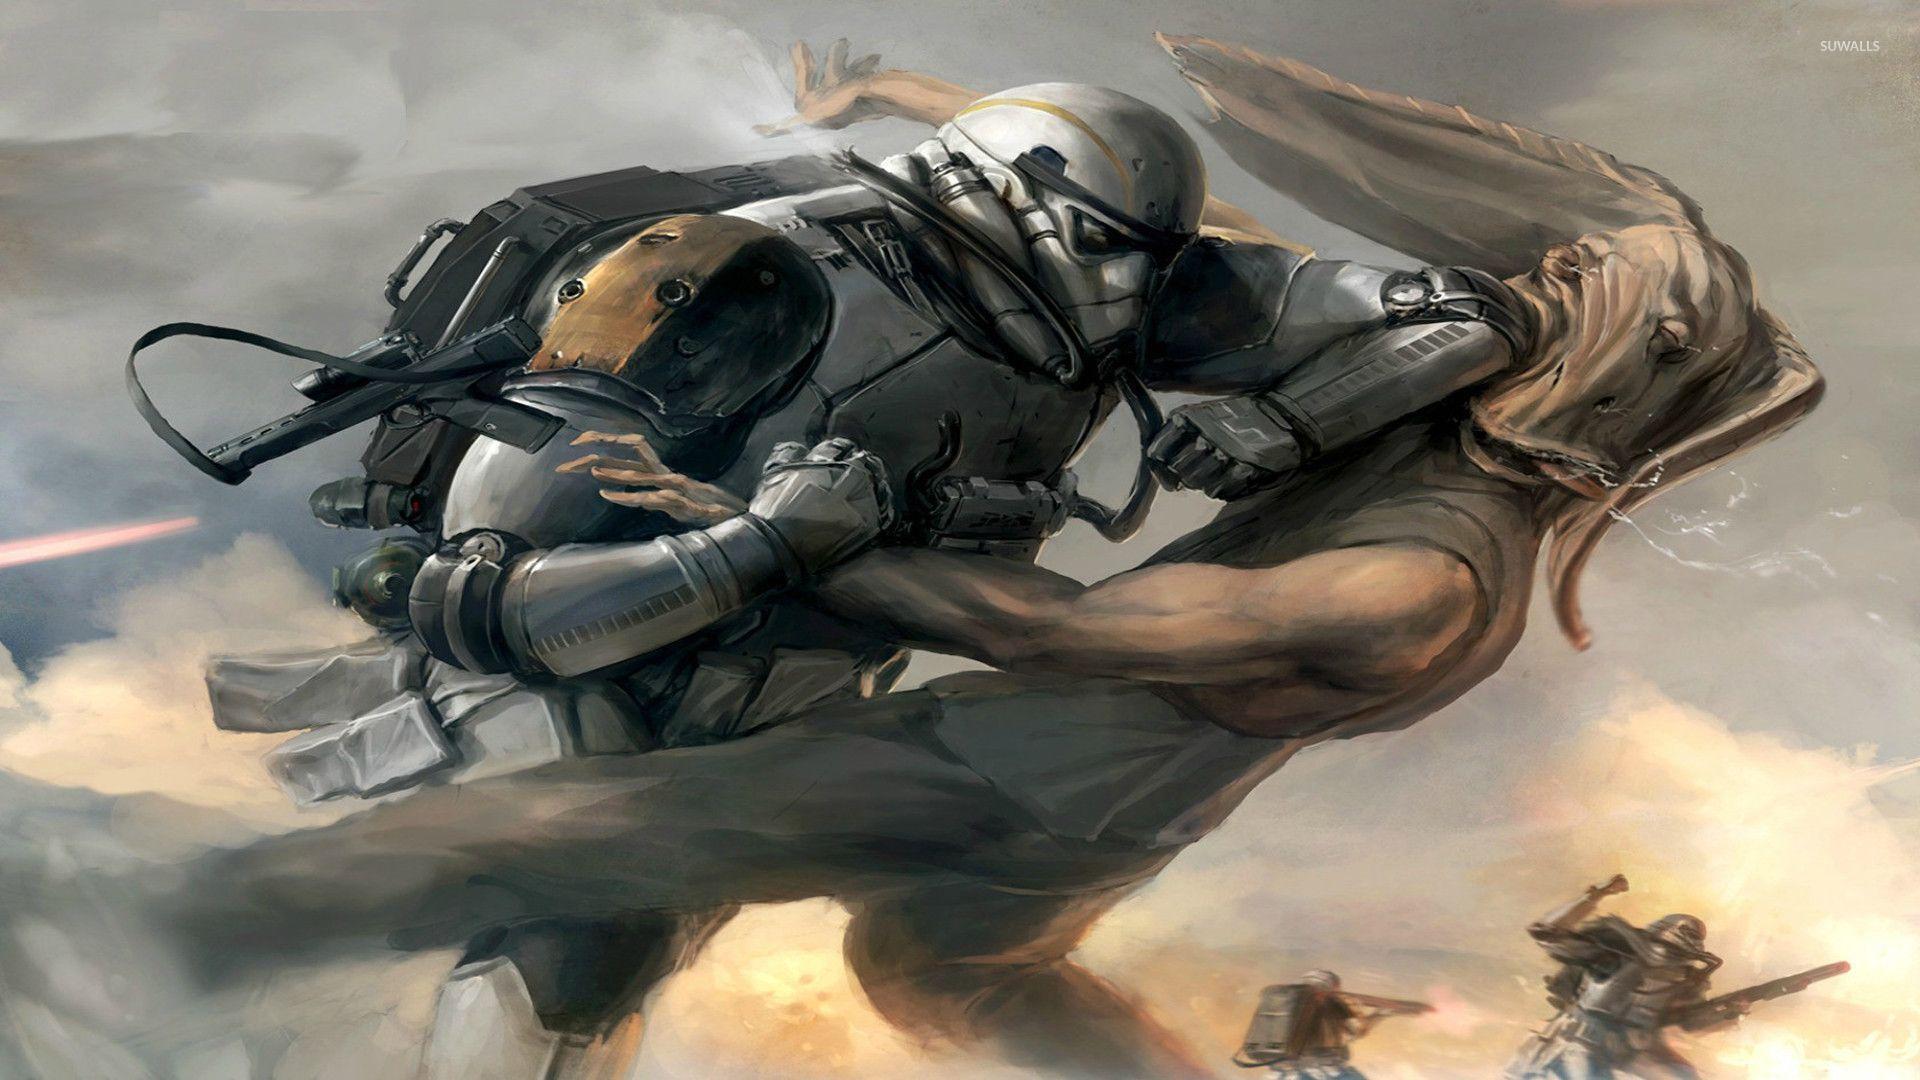 Star Wars battle wallpaper   1211013 1920x1080